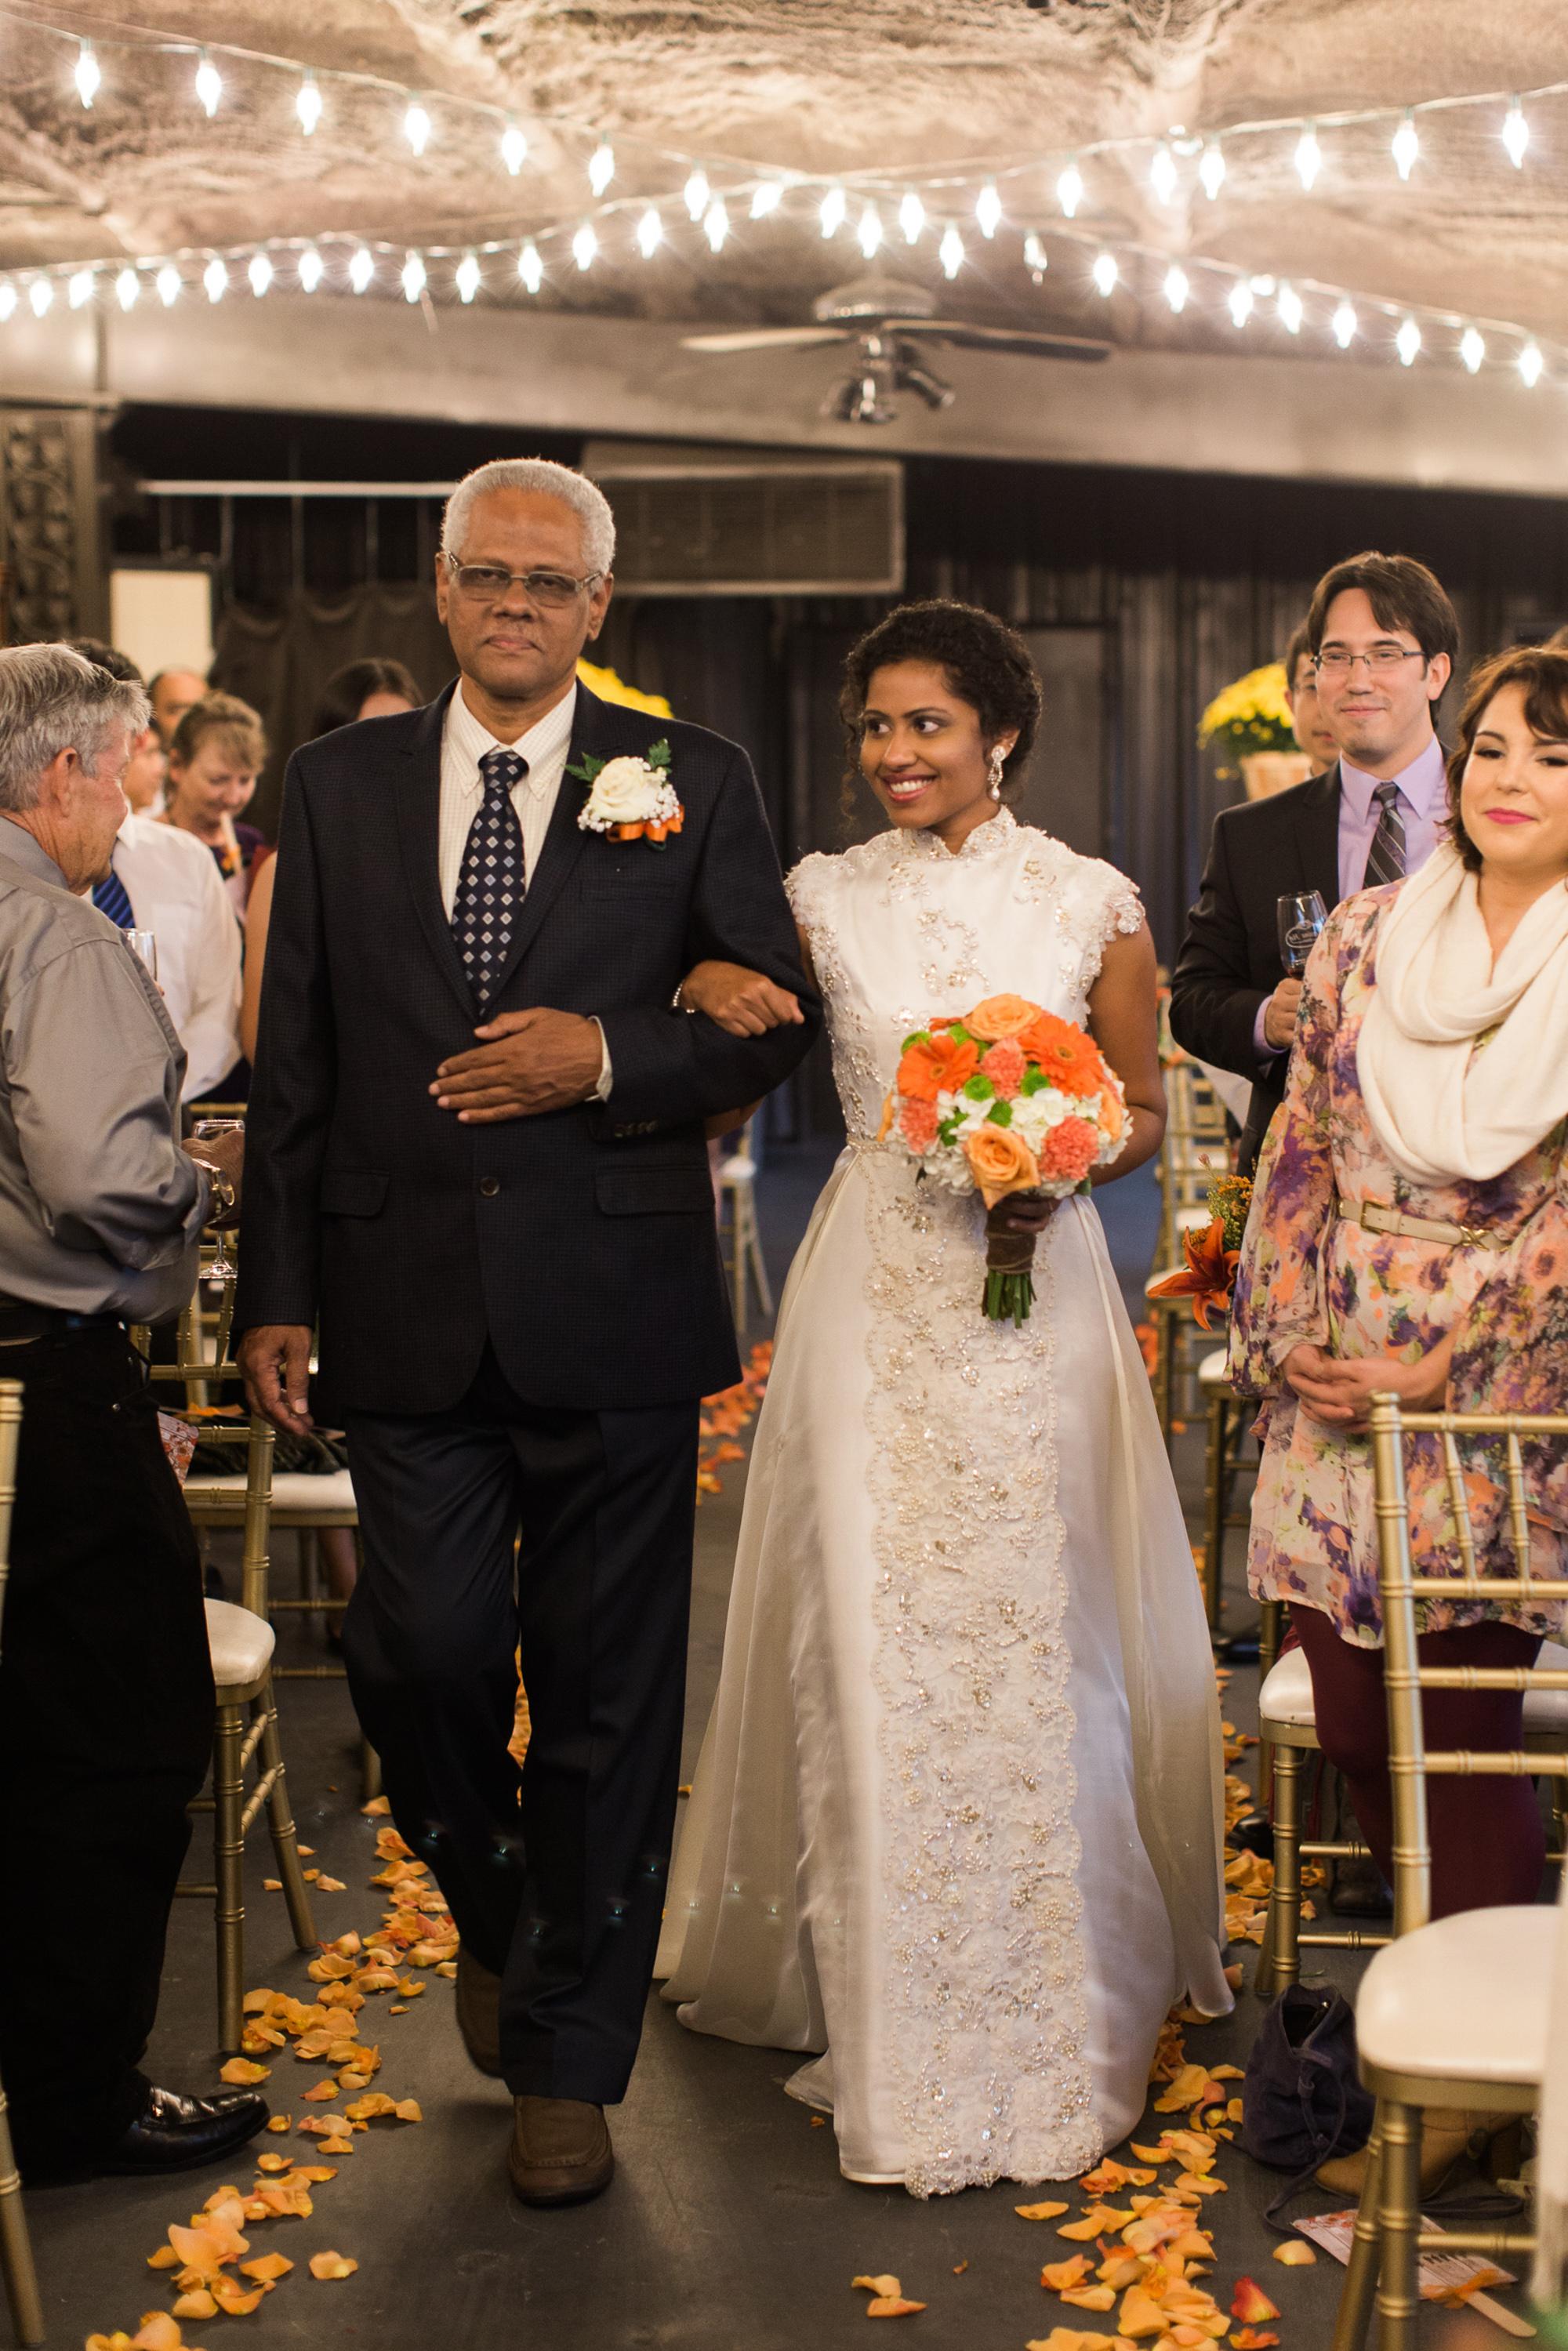 4edd9-messina-hof-wedding-30messina-hof-wedding-30.jpg